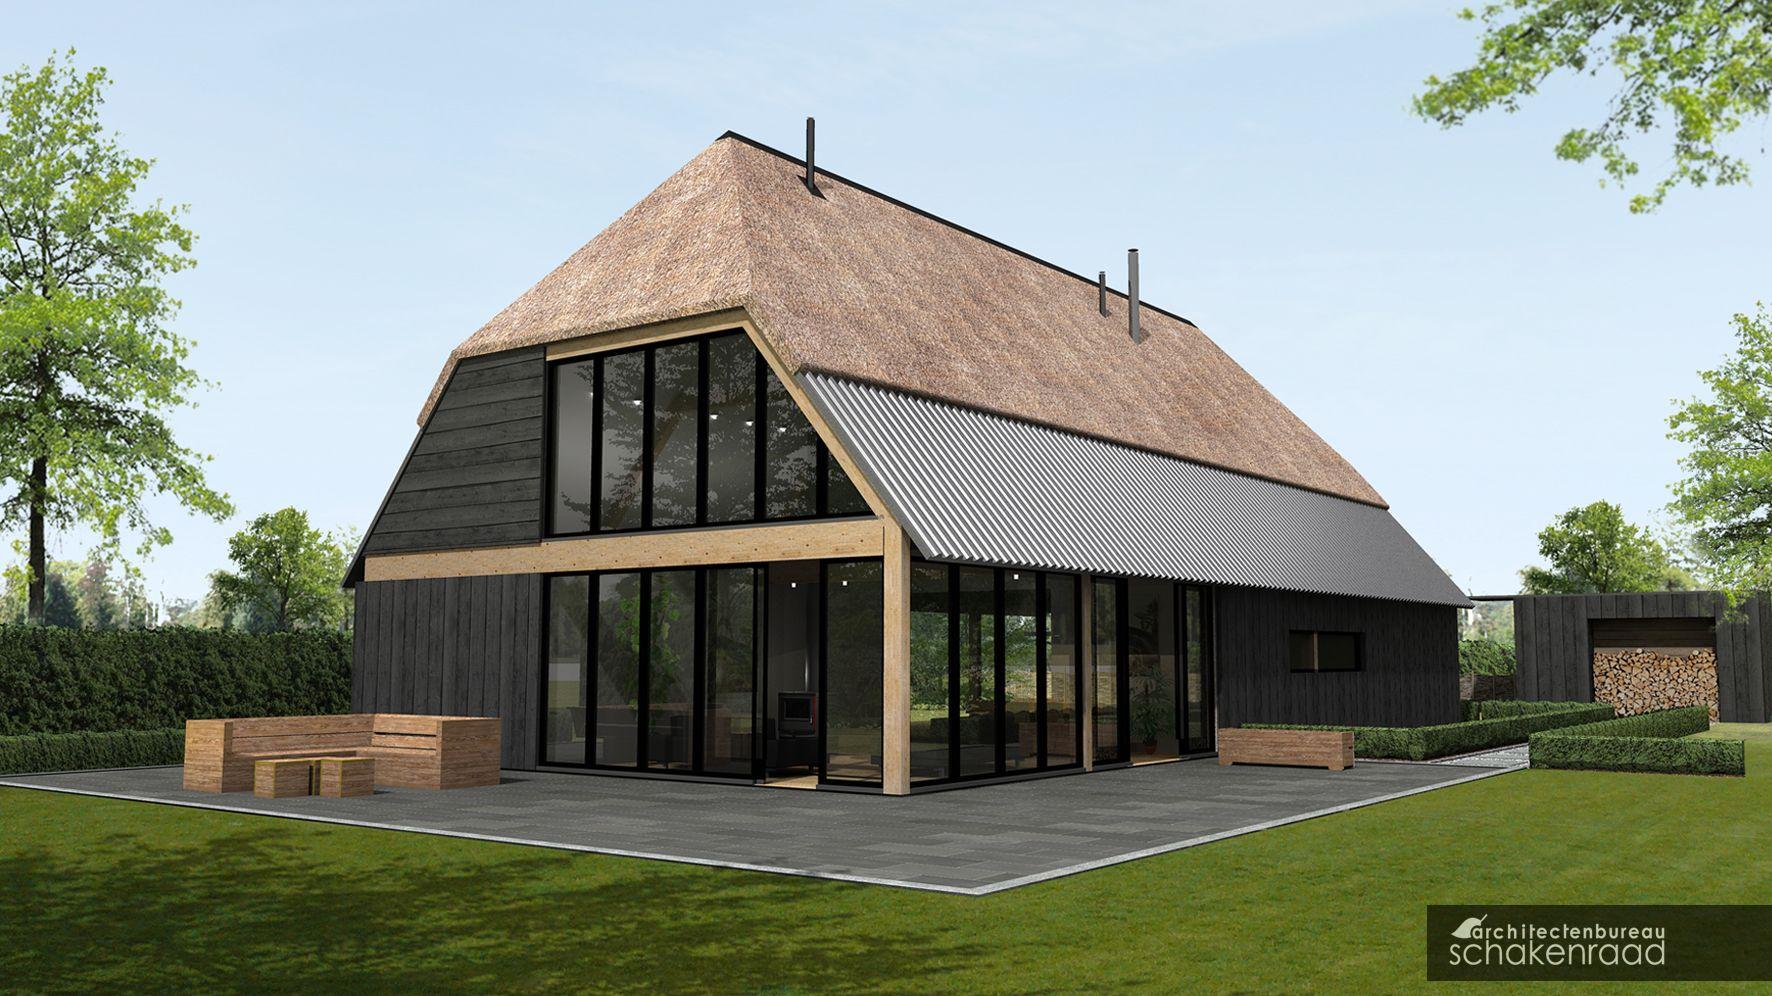 Architectenbureau schakenraad moderne boerderij woning for Cost to build modern home